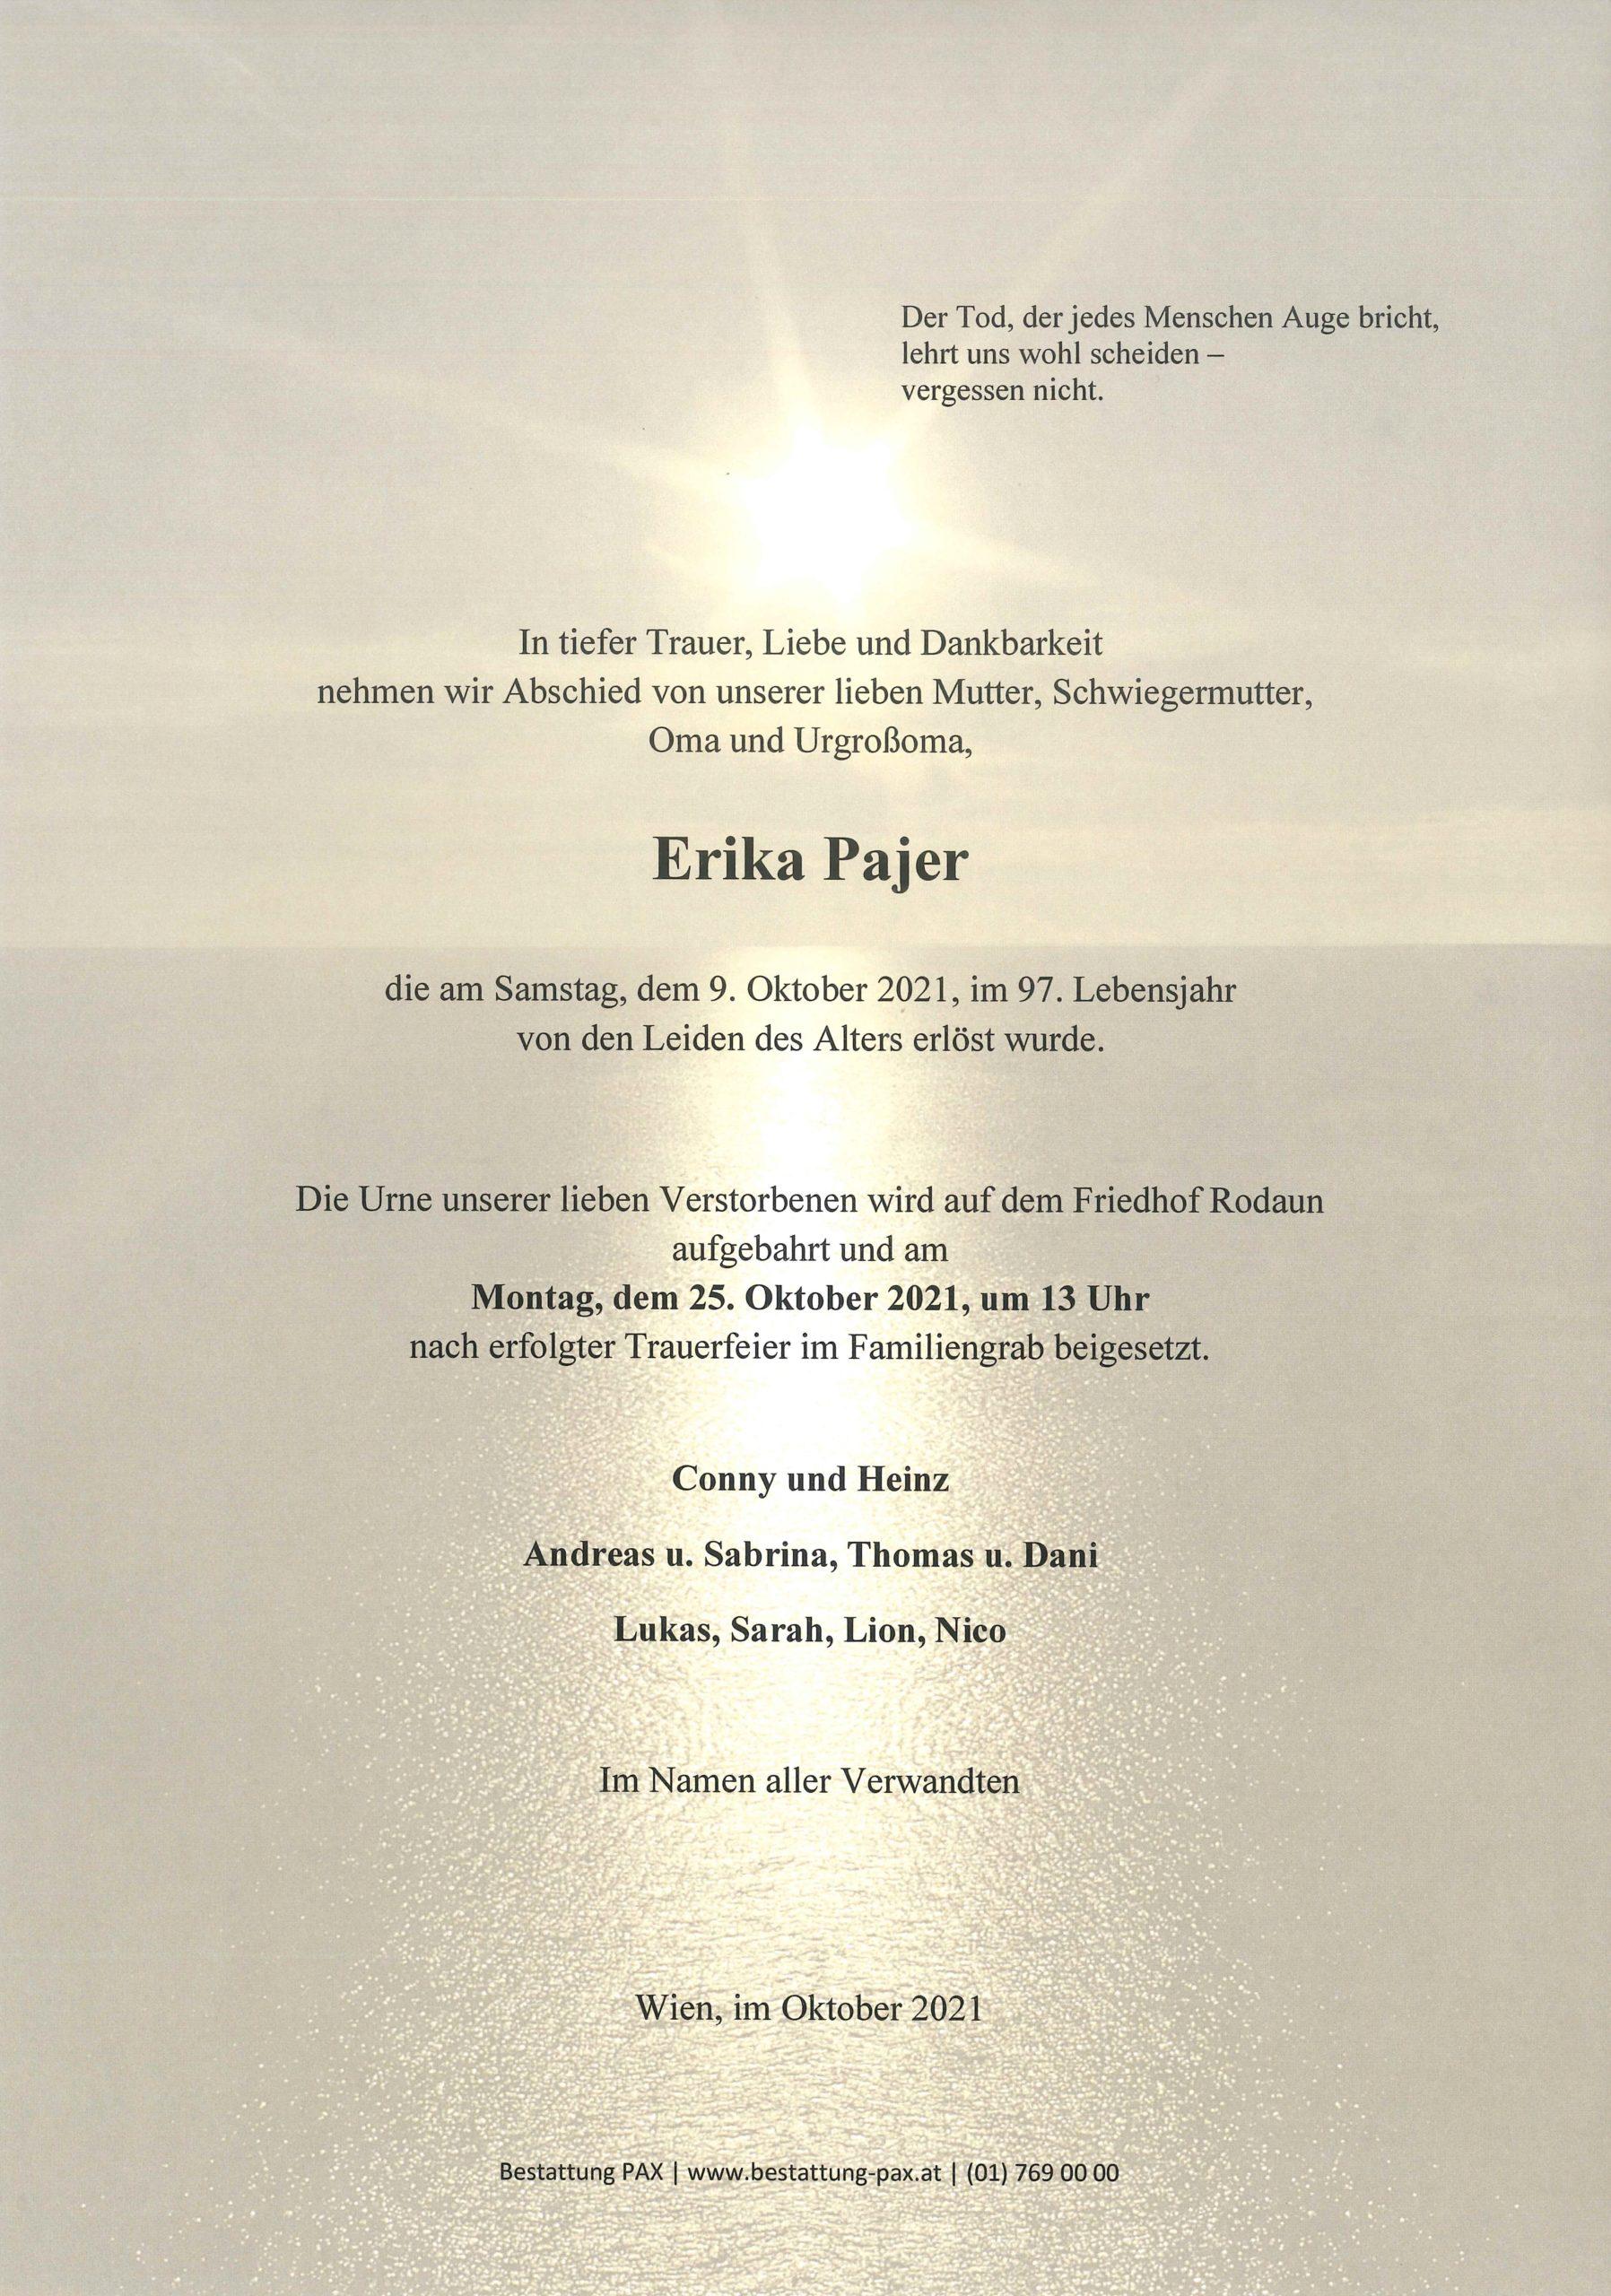 Erika Pajer